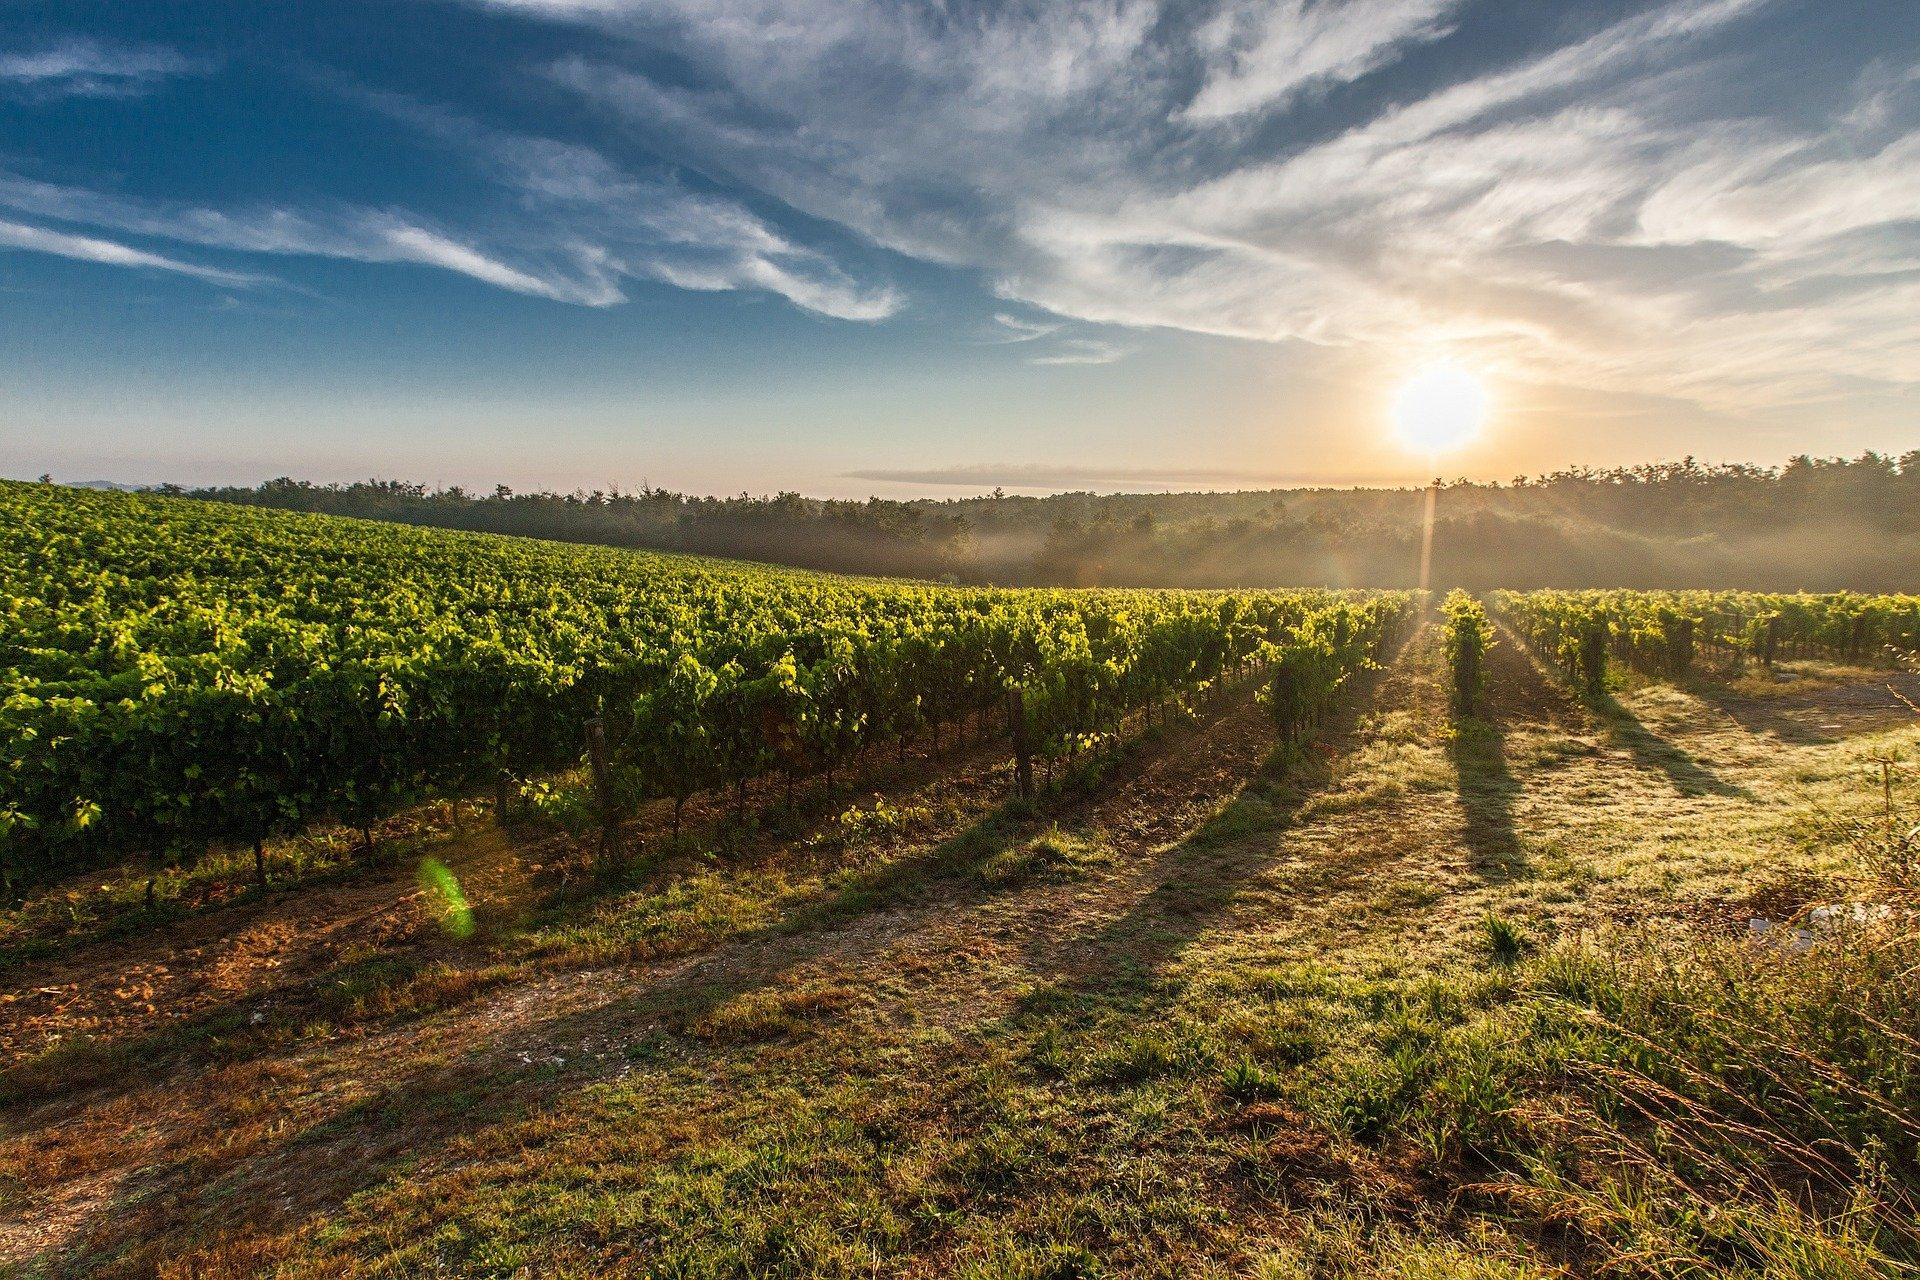 vineyard-428041_1920